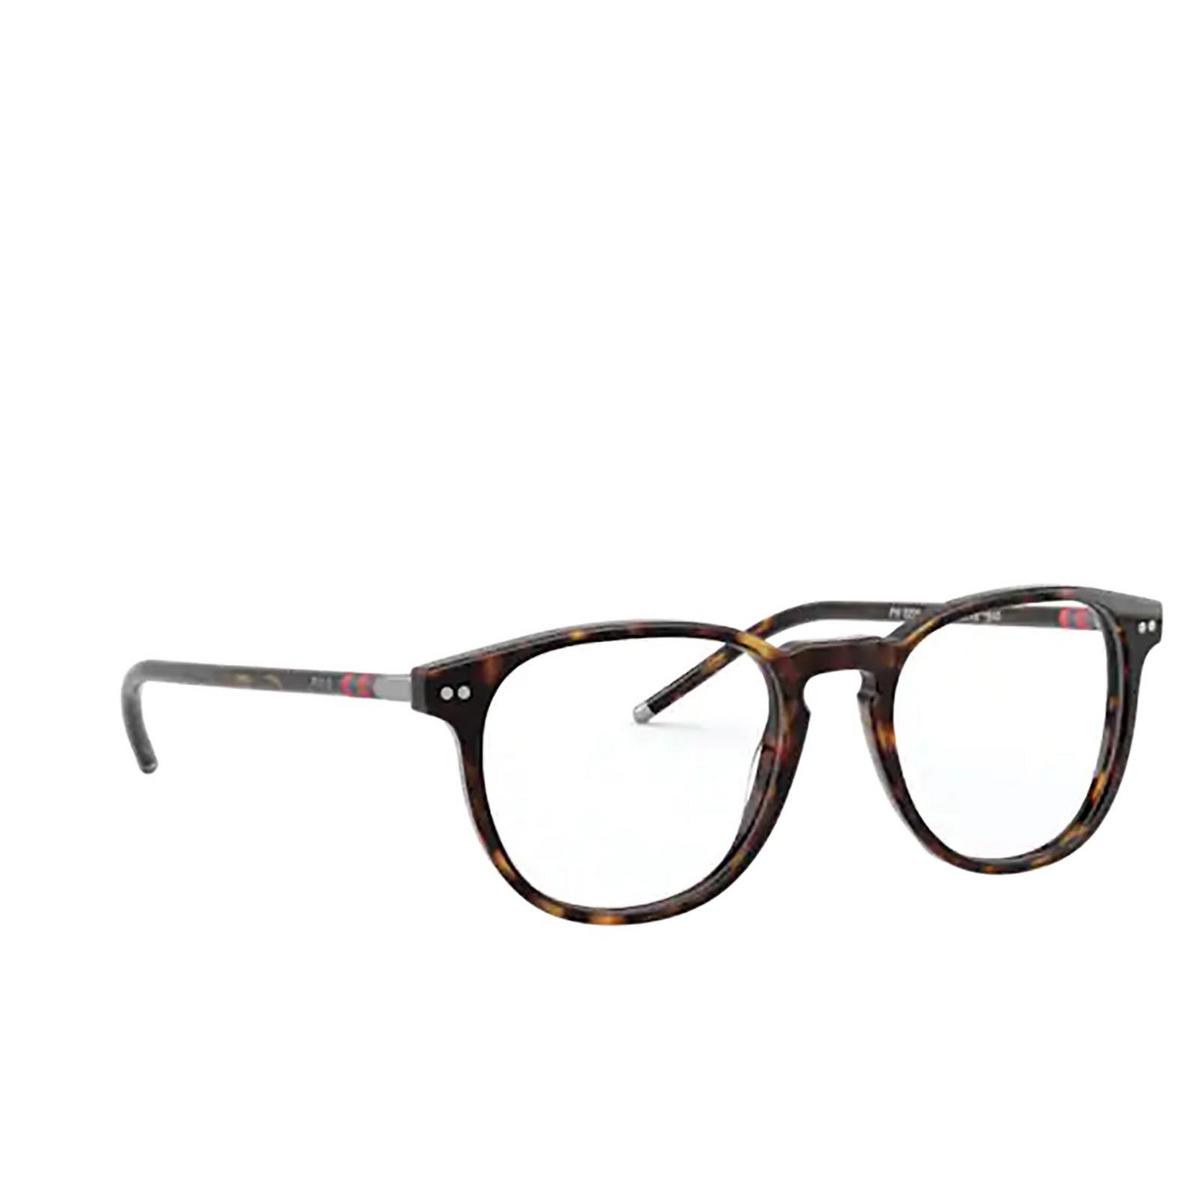 Polo Ralph Lauren® Square Eyeglasses: PH2224 color Shiny Dark Havana 5003.